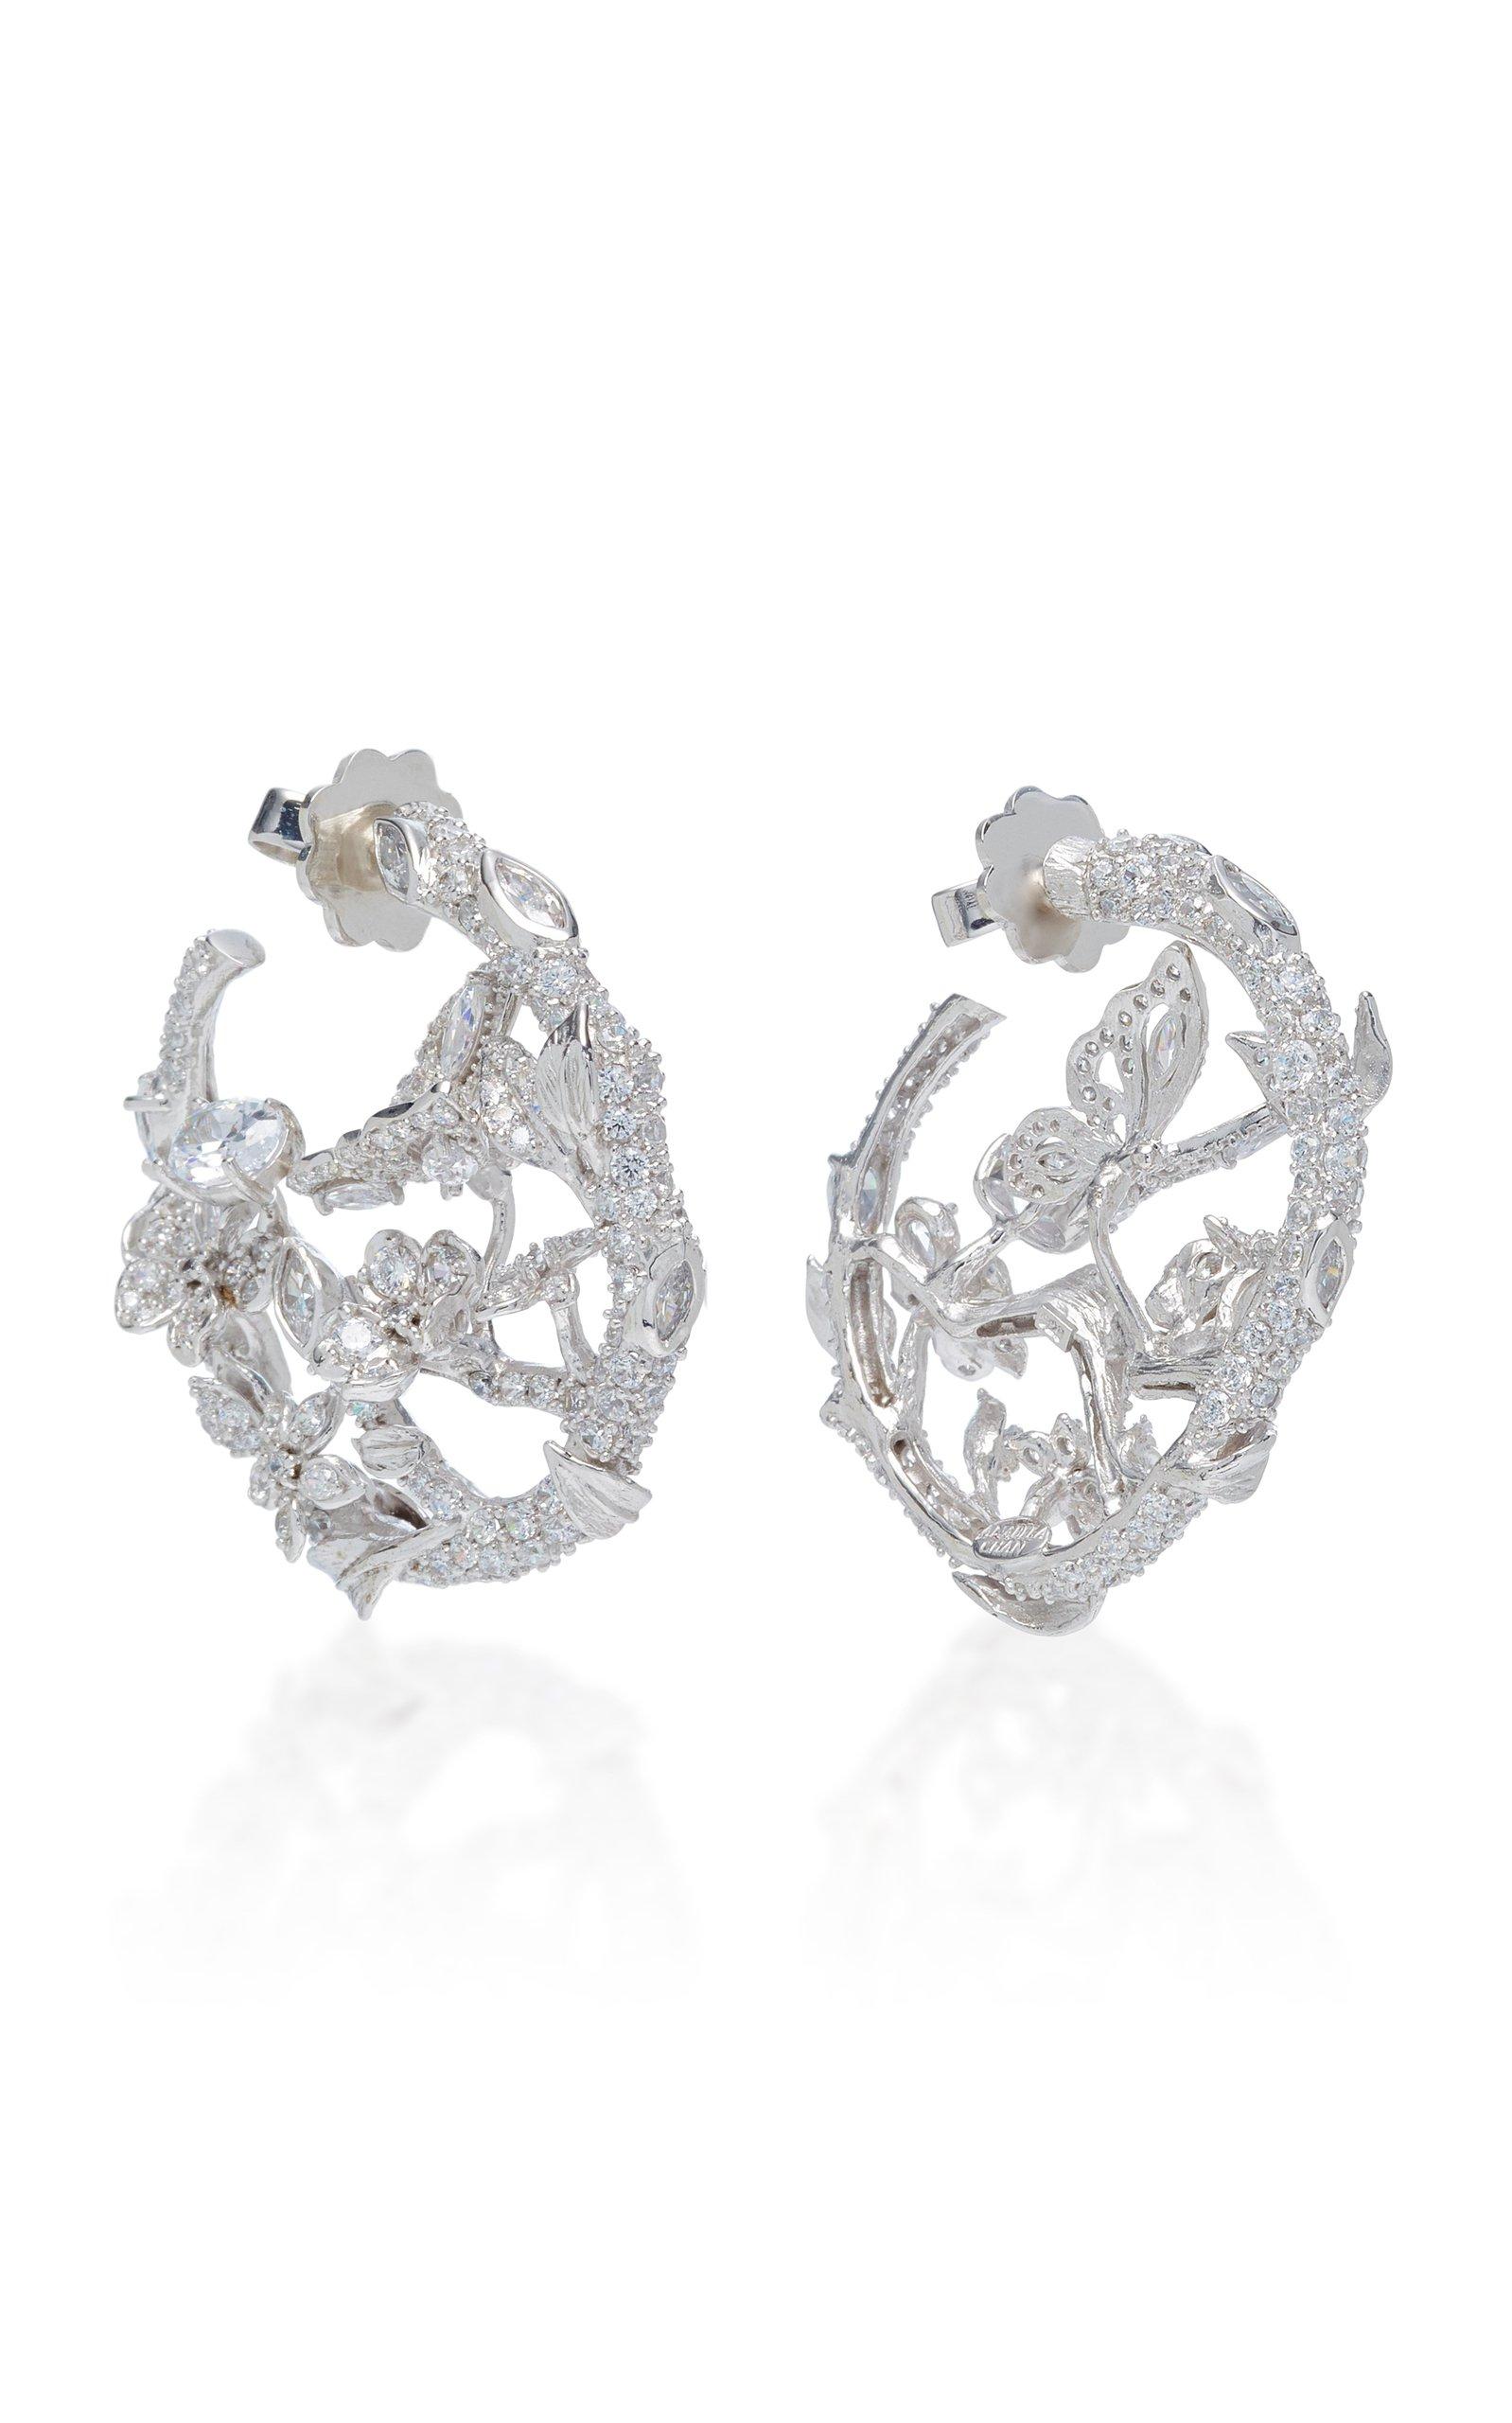 Anabela Chan 18K White Gold Vermeil Diamond English Garden Earrings